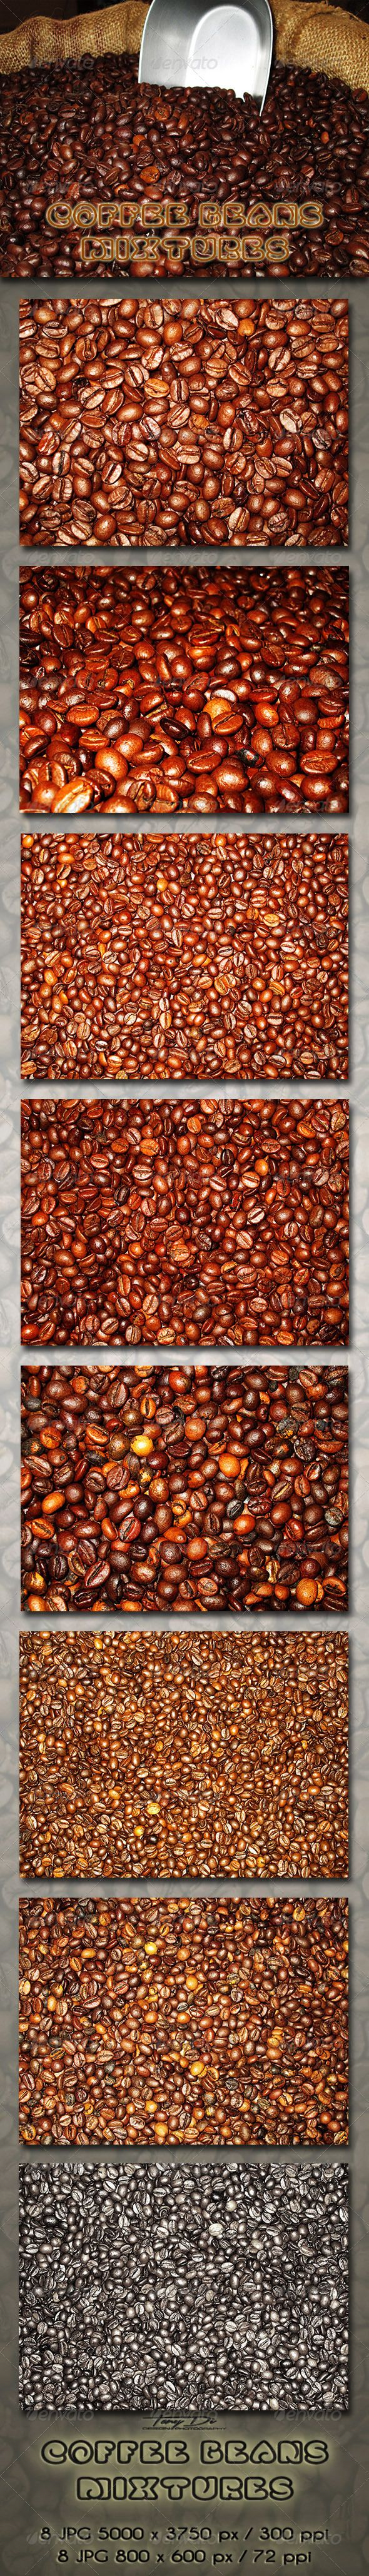 Coffee Beans Mixtures - $3